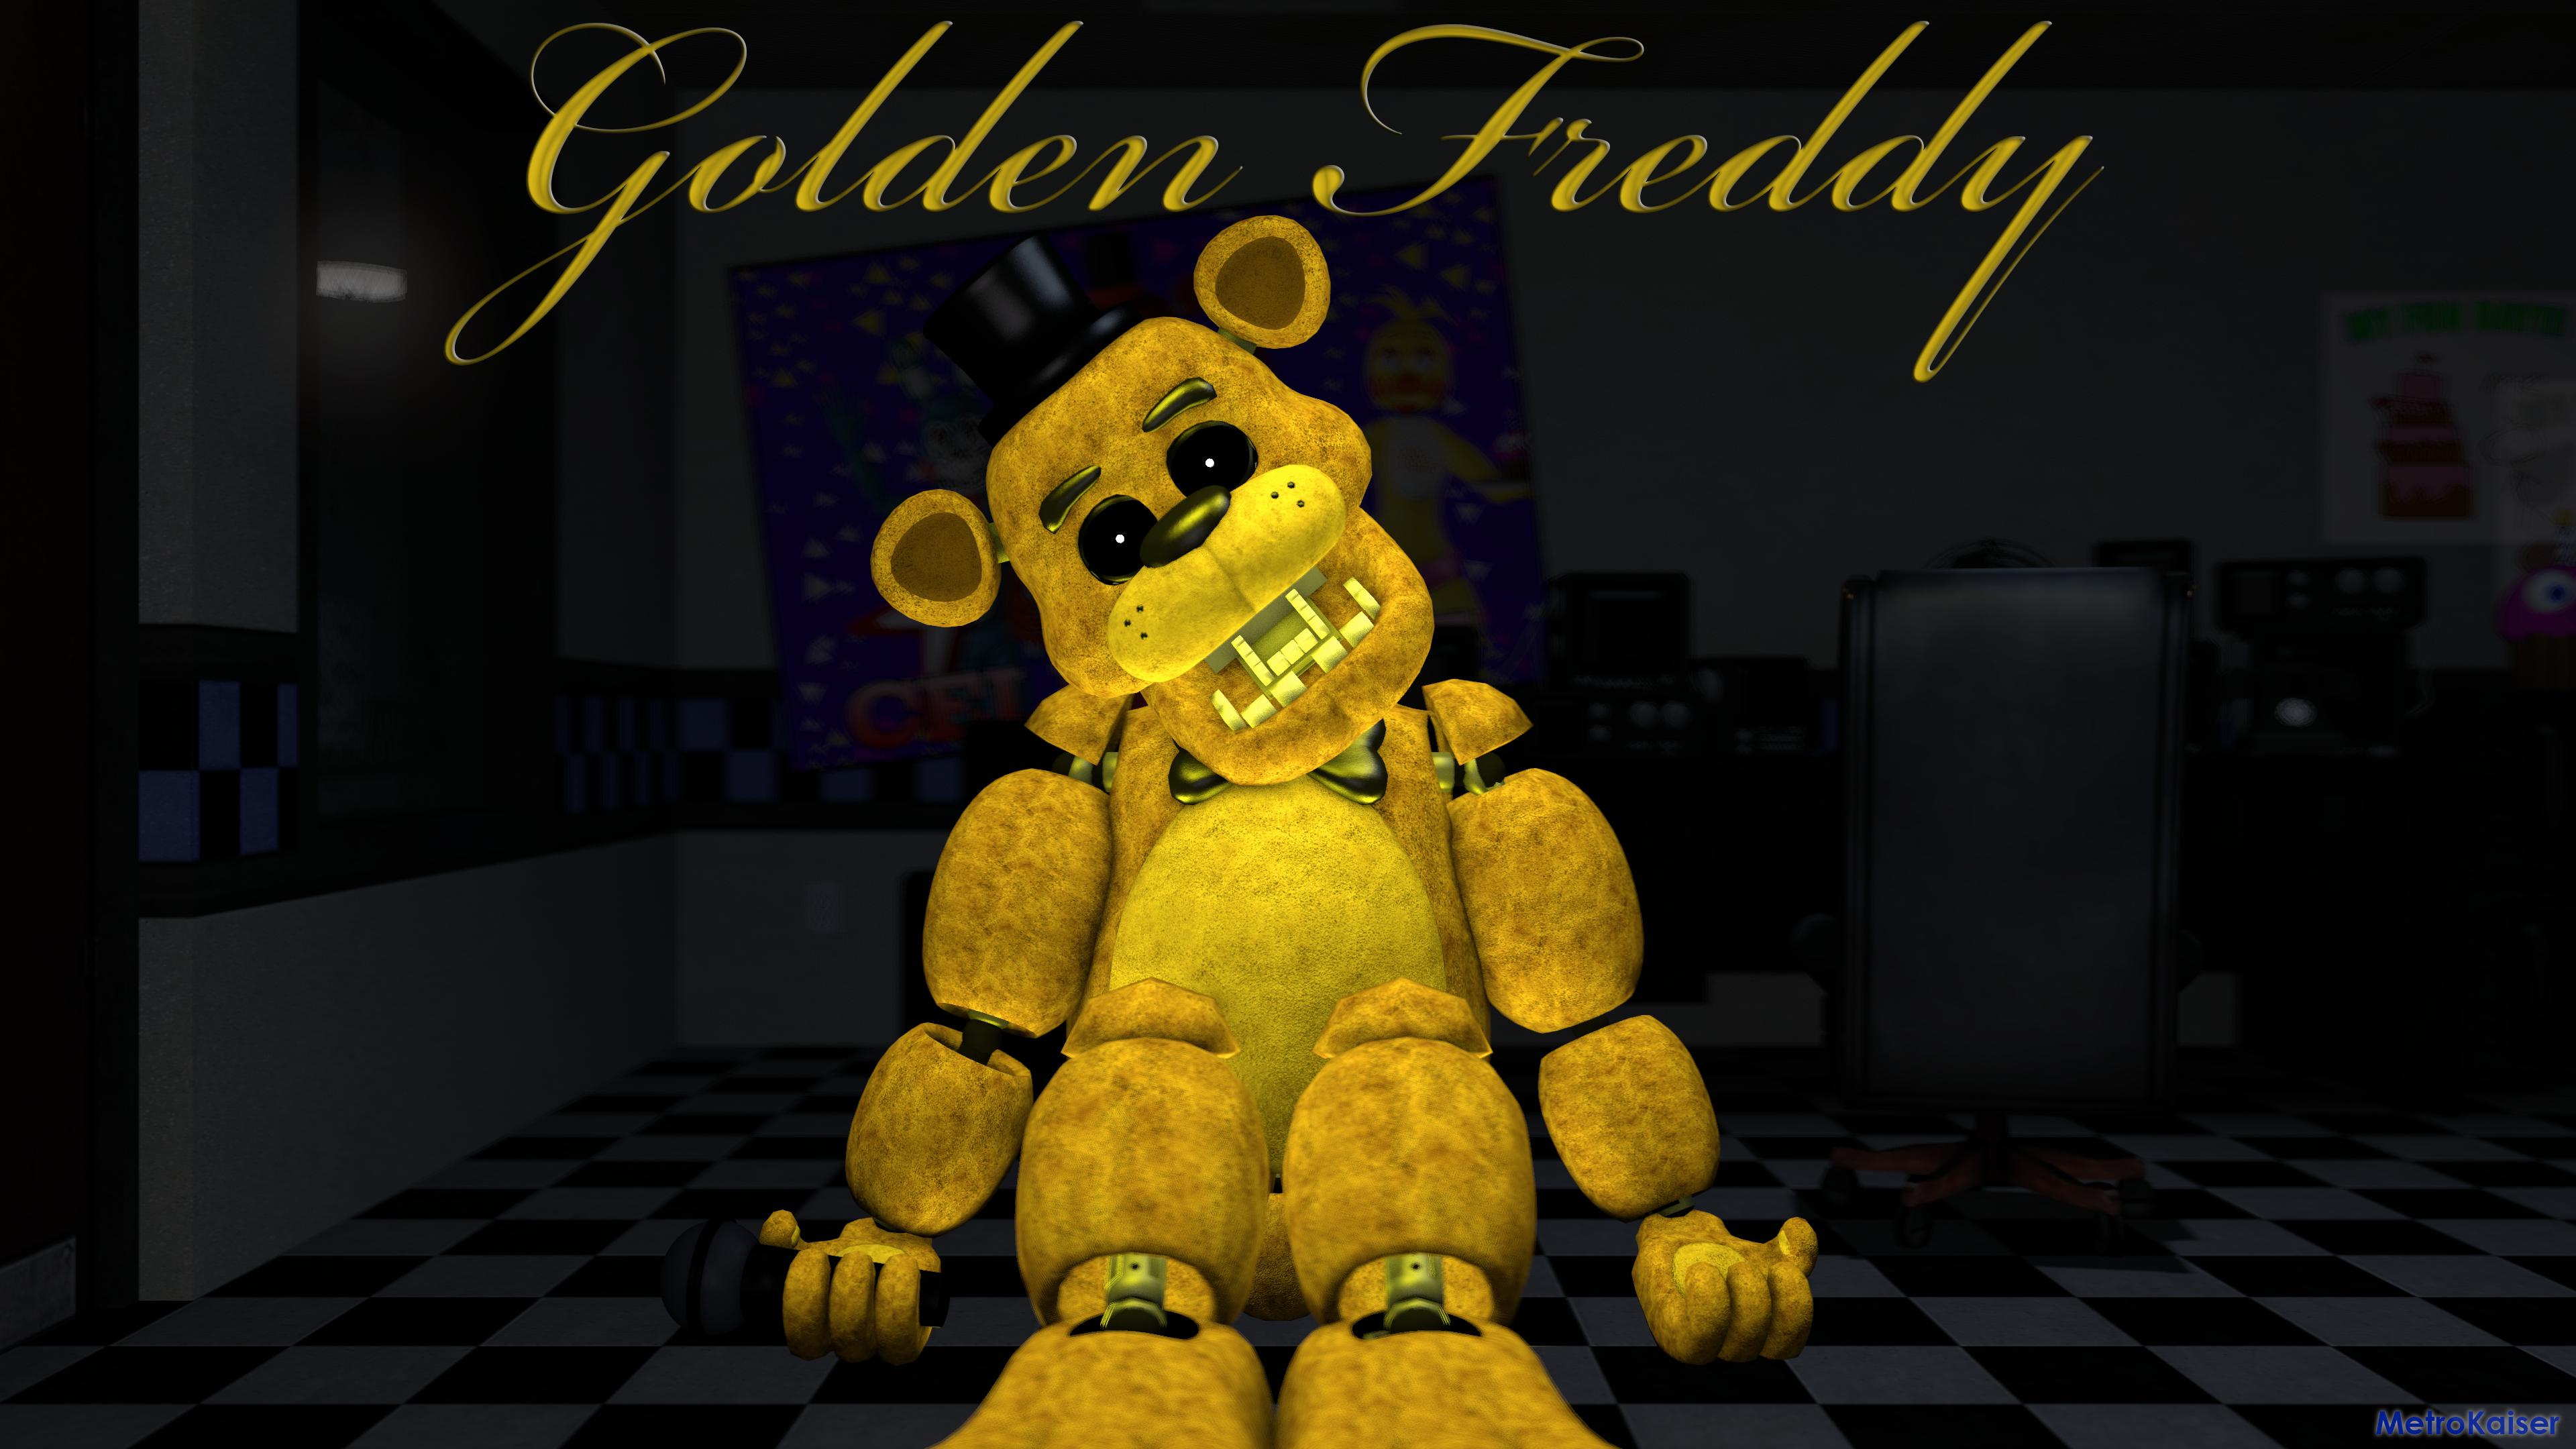 [SFM FNAF] Golden Freddy wallpaper 4K by wstmetro on 3840x2160